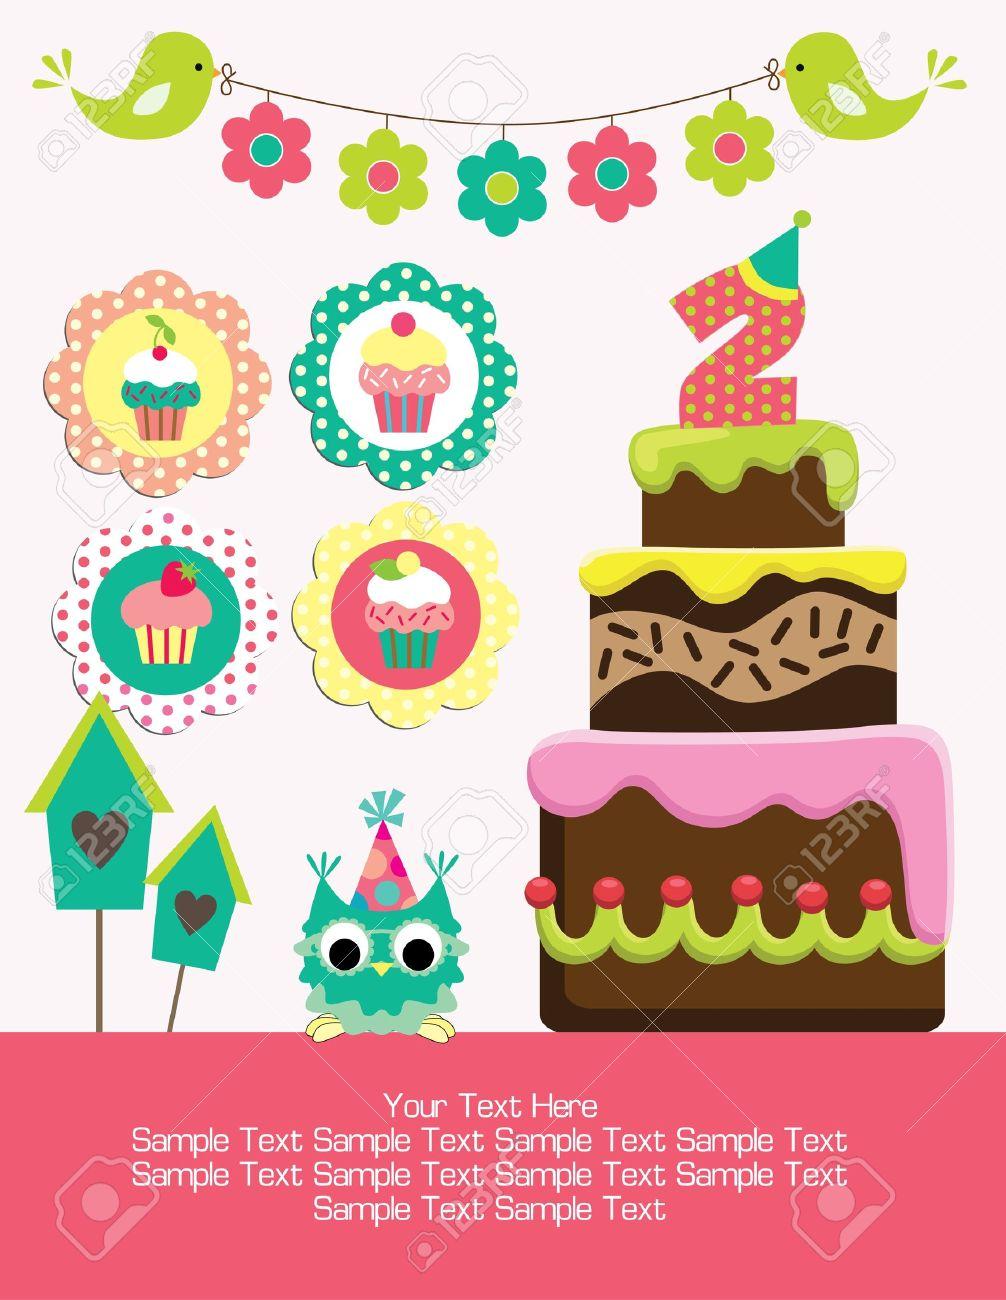 Birth day cards design robertottni birth day cards design bookmarktalkfo Choice Image